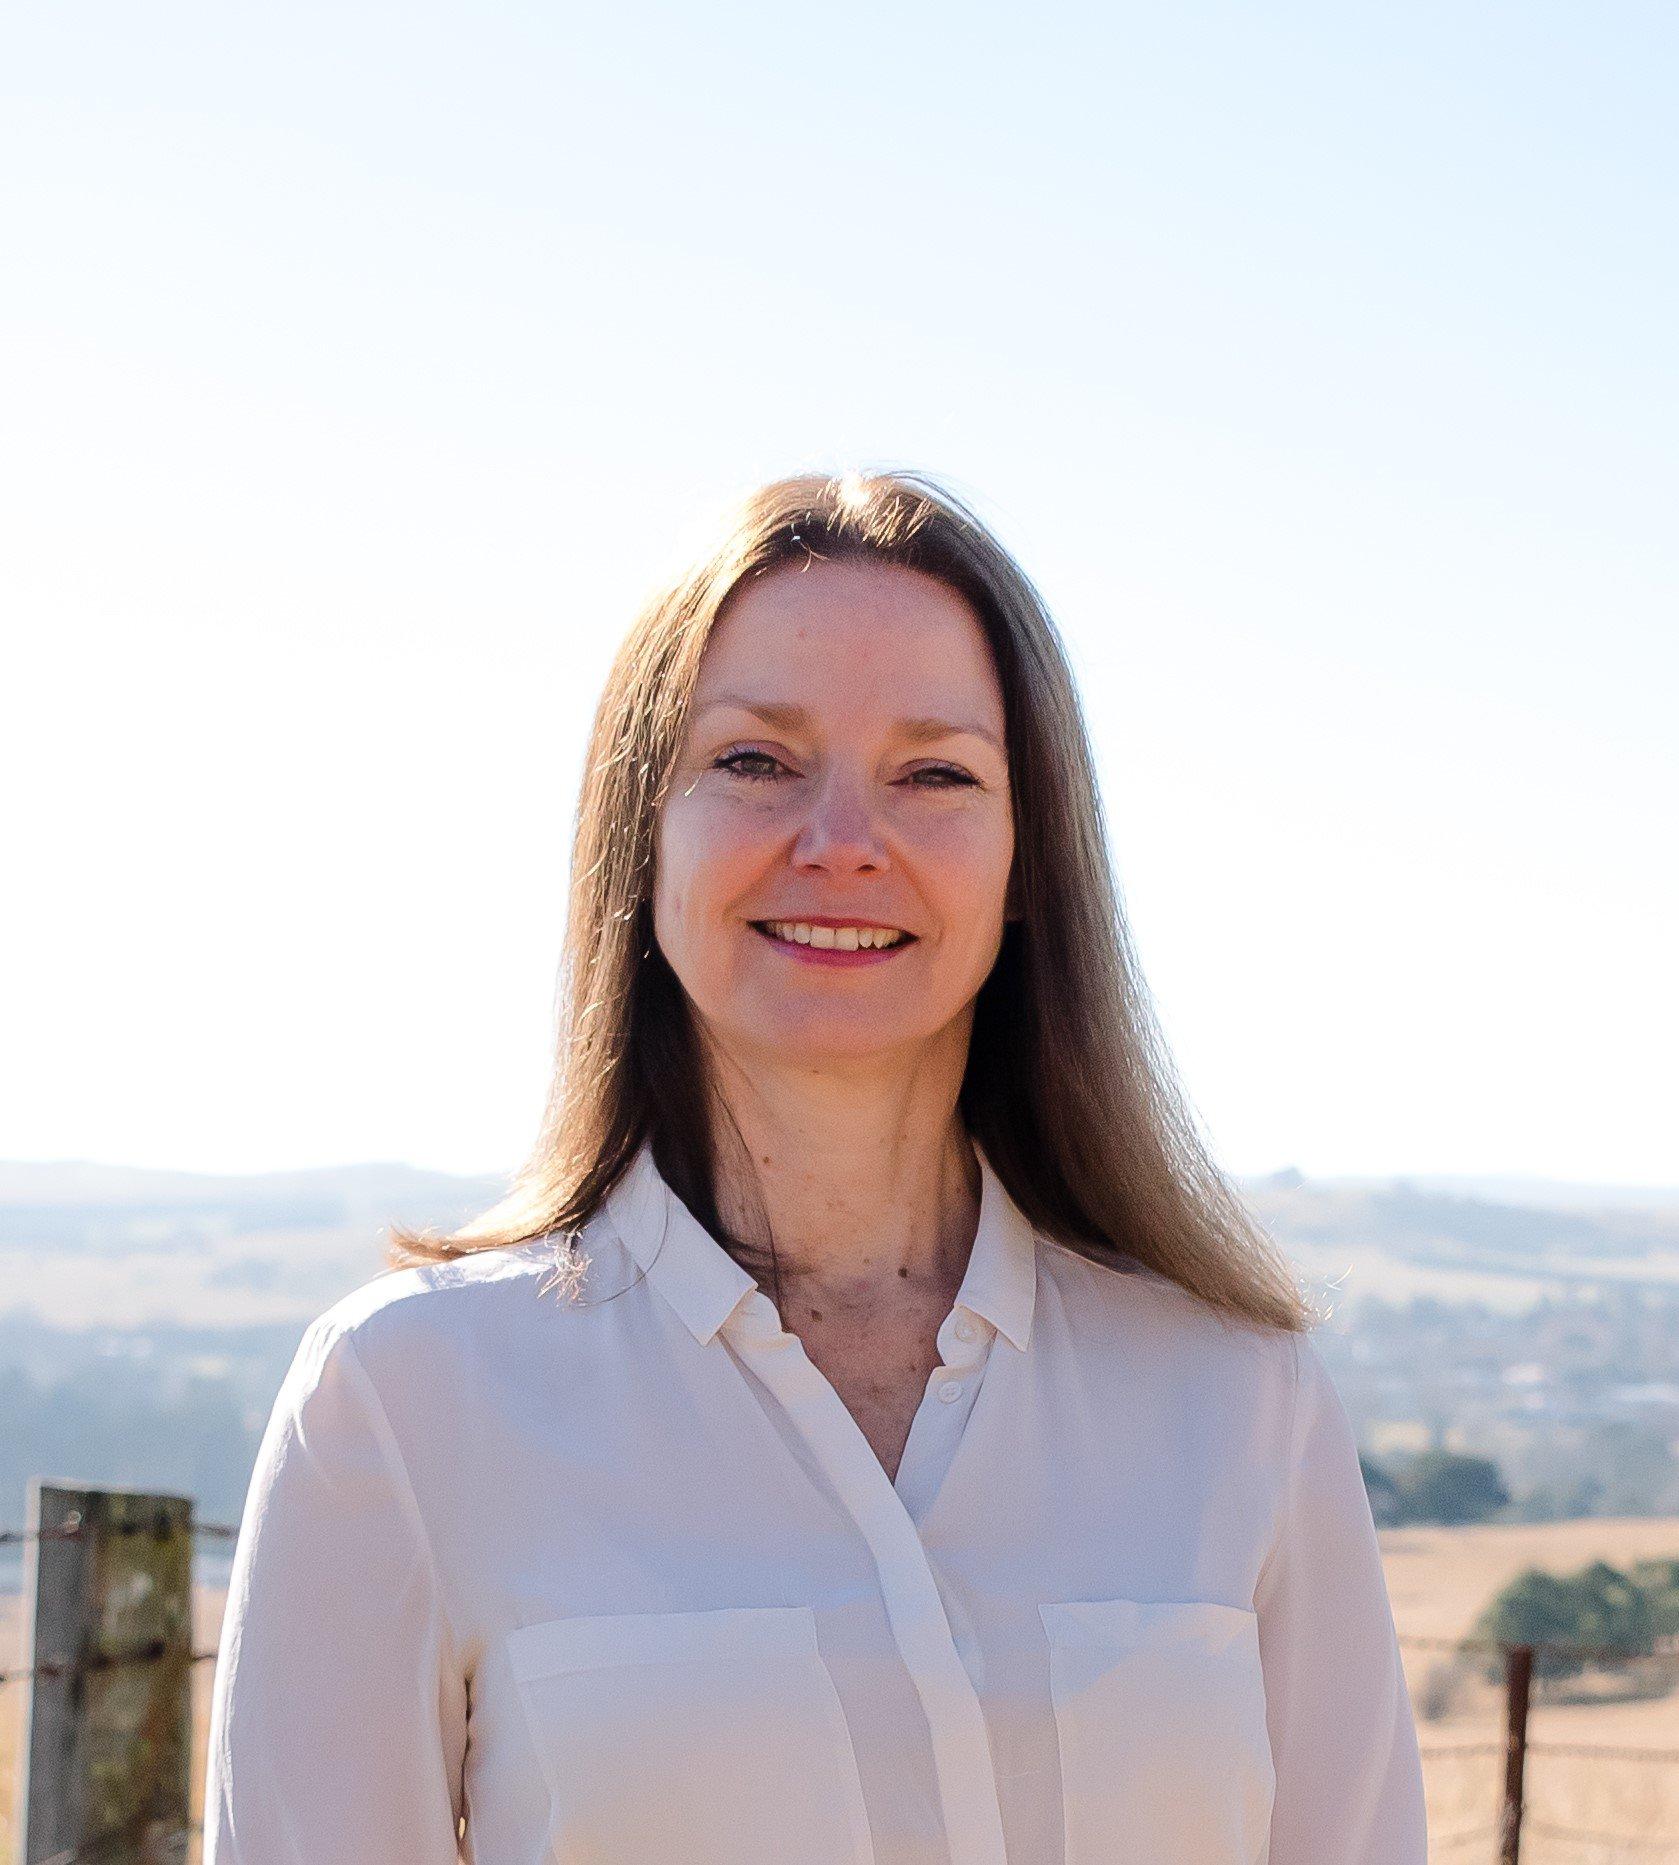 Suzanne Carter